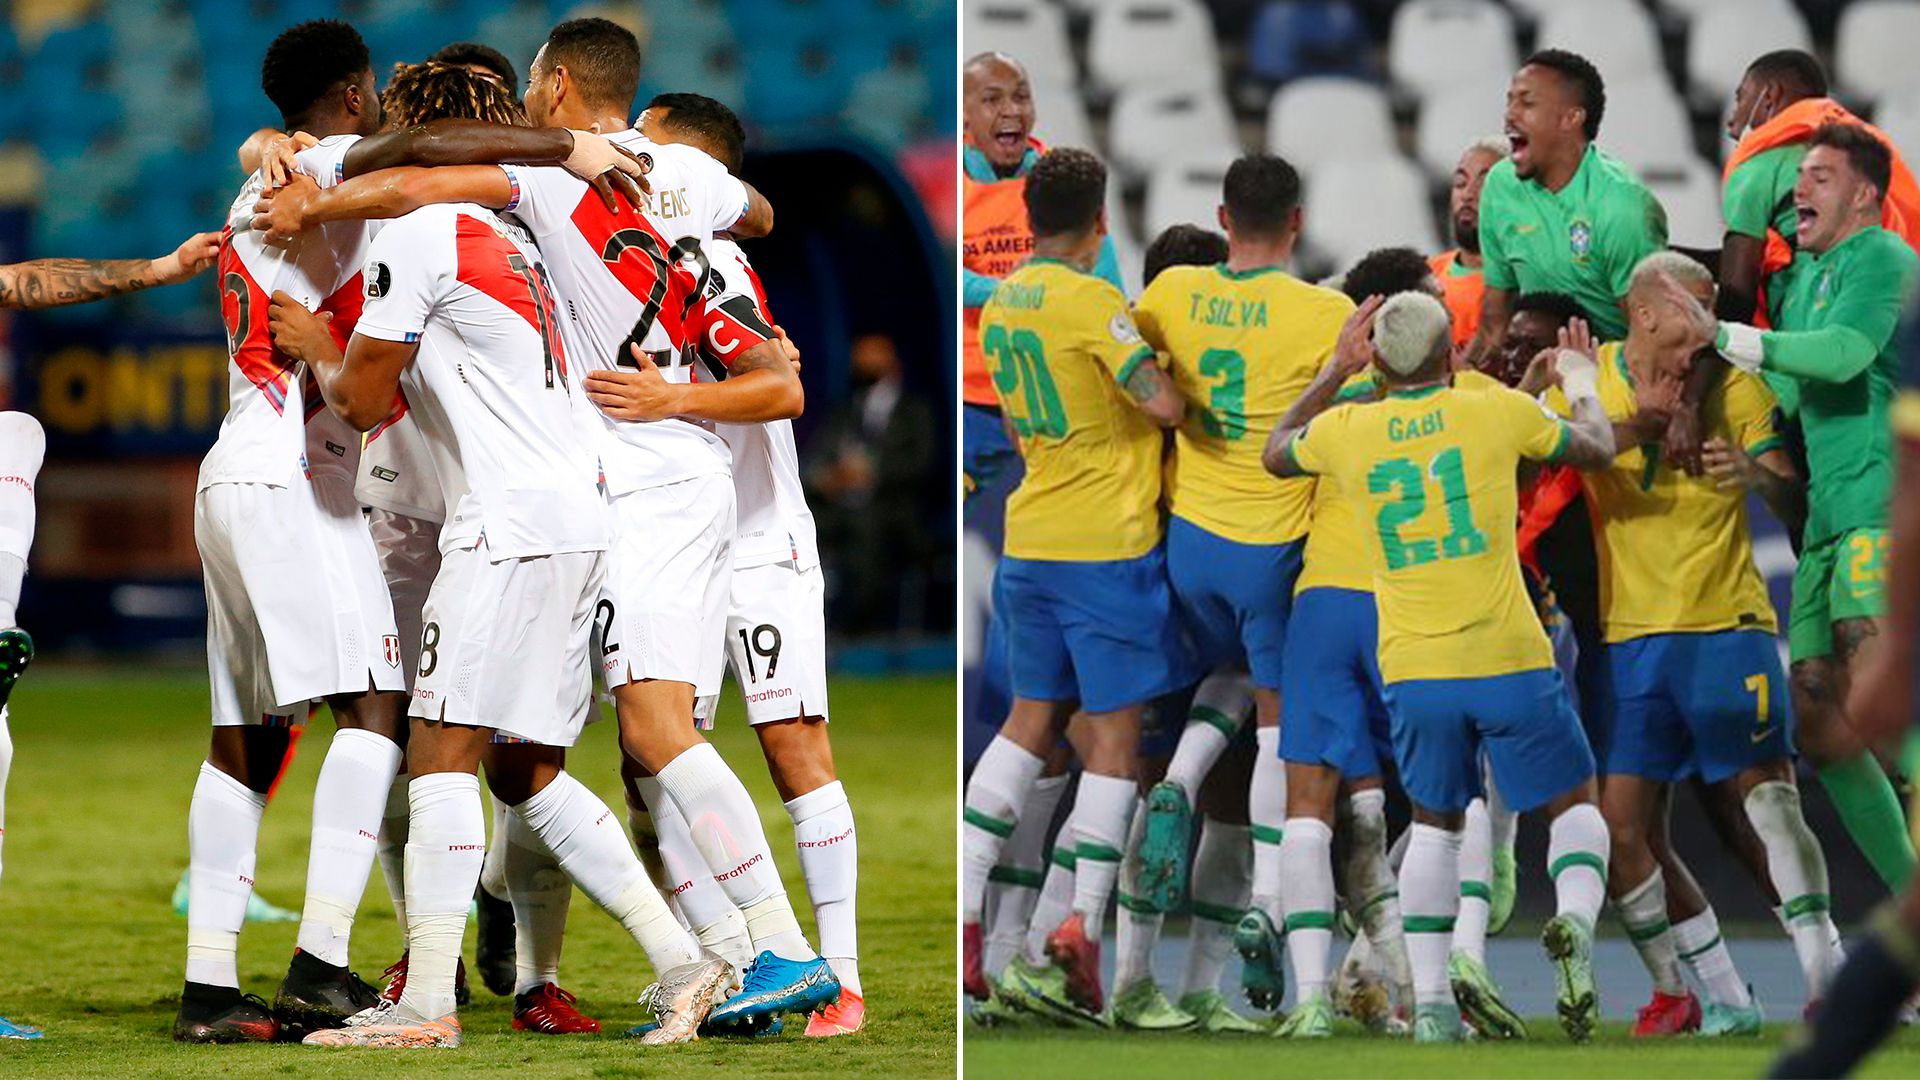 Copa América - Posibles Semifinales (Perú vs Chile - Perú vs Brasil)